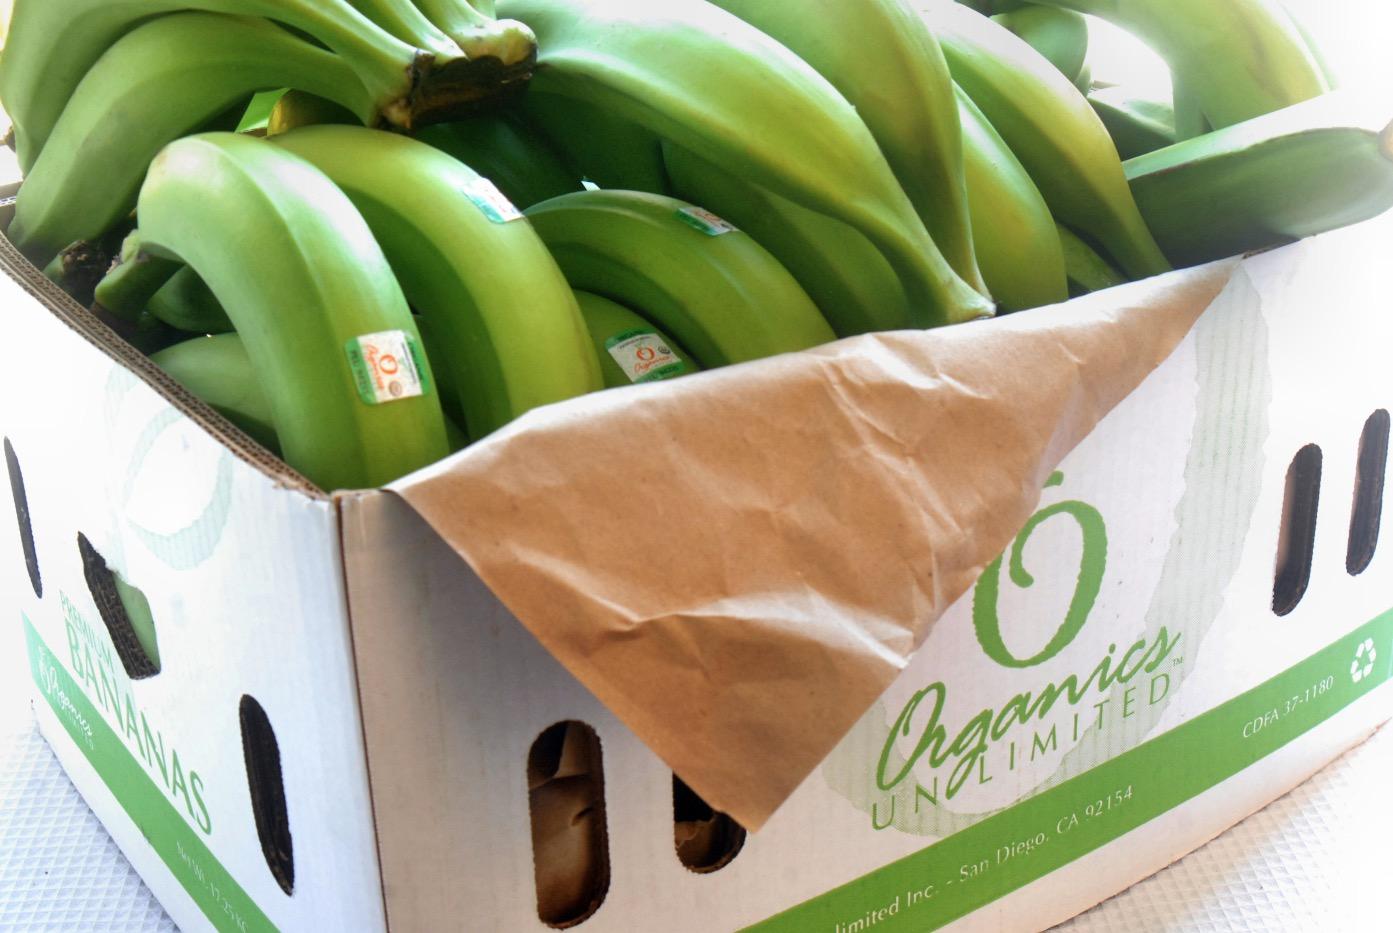 Organics Unlimited Bananas